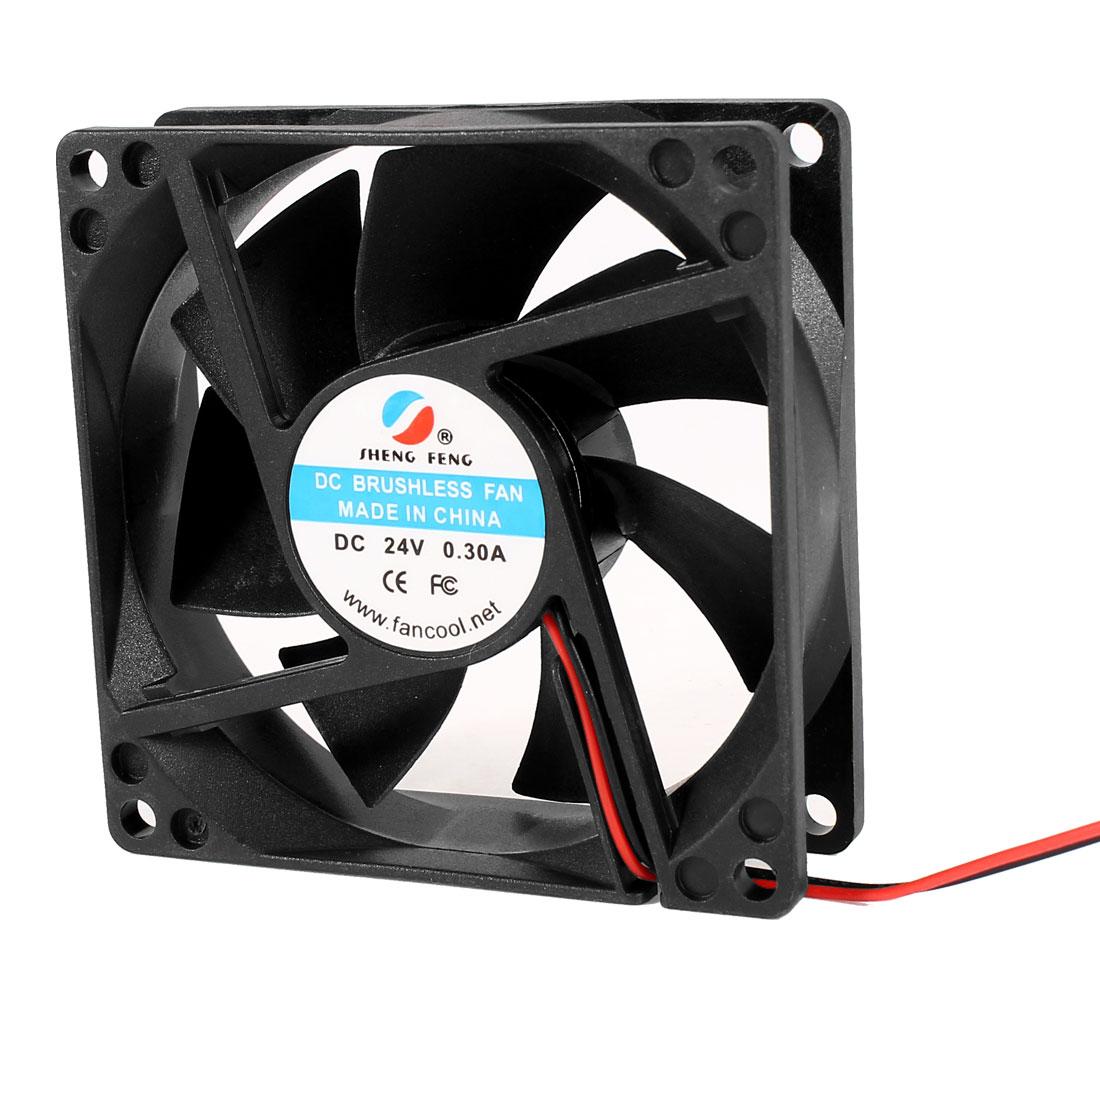 DC 24V 0.30A 80mmx25mm Cooling Fan Black for PC Case CPU Cooler Radiator